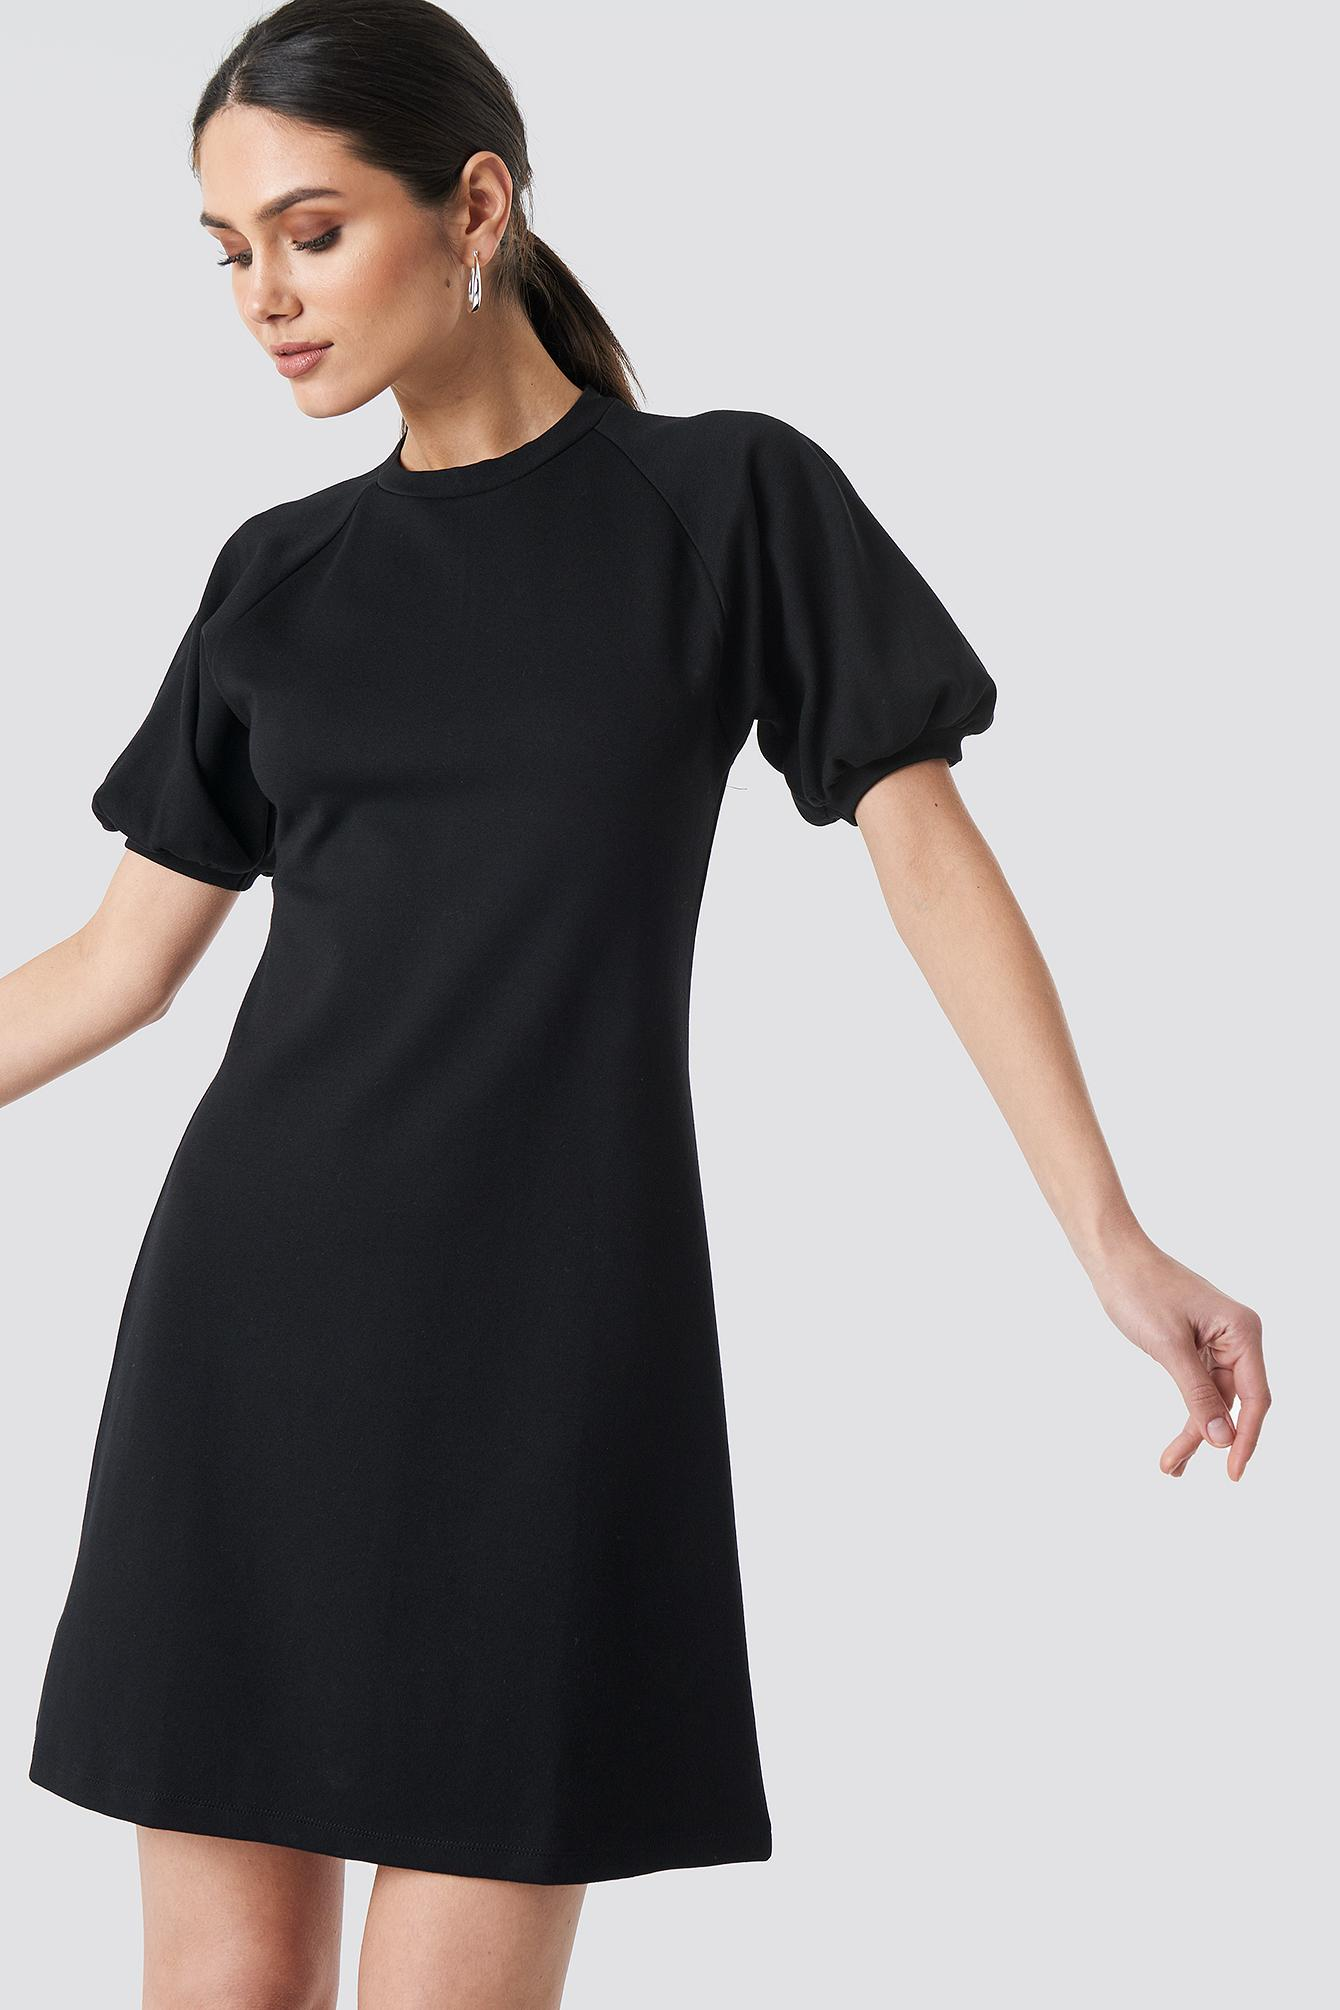 cde37ce1acfcd Lyst - Trendyol Balloon Sleeve Knitted Dress Black in Black